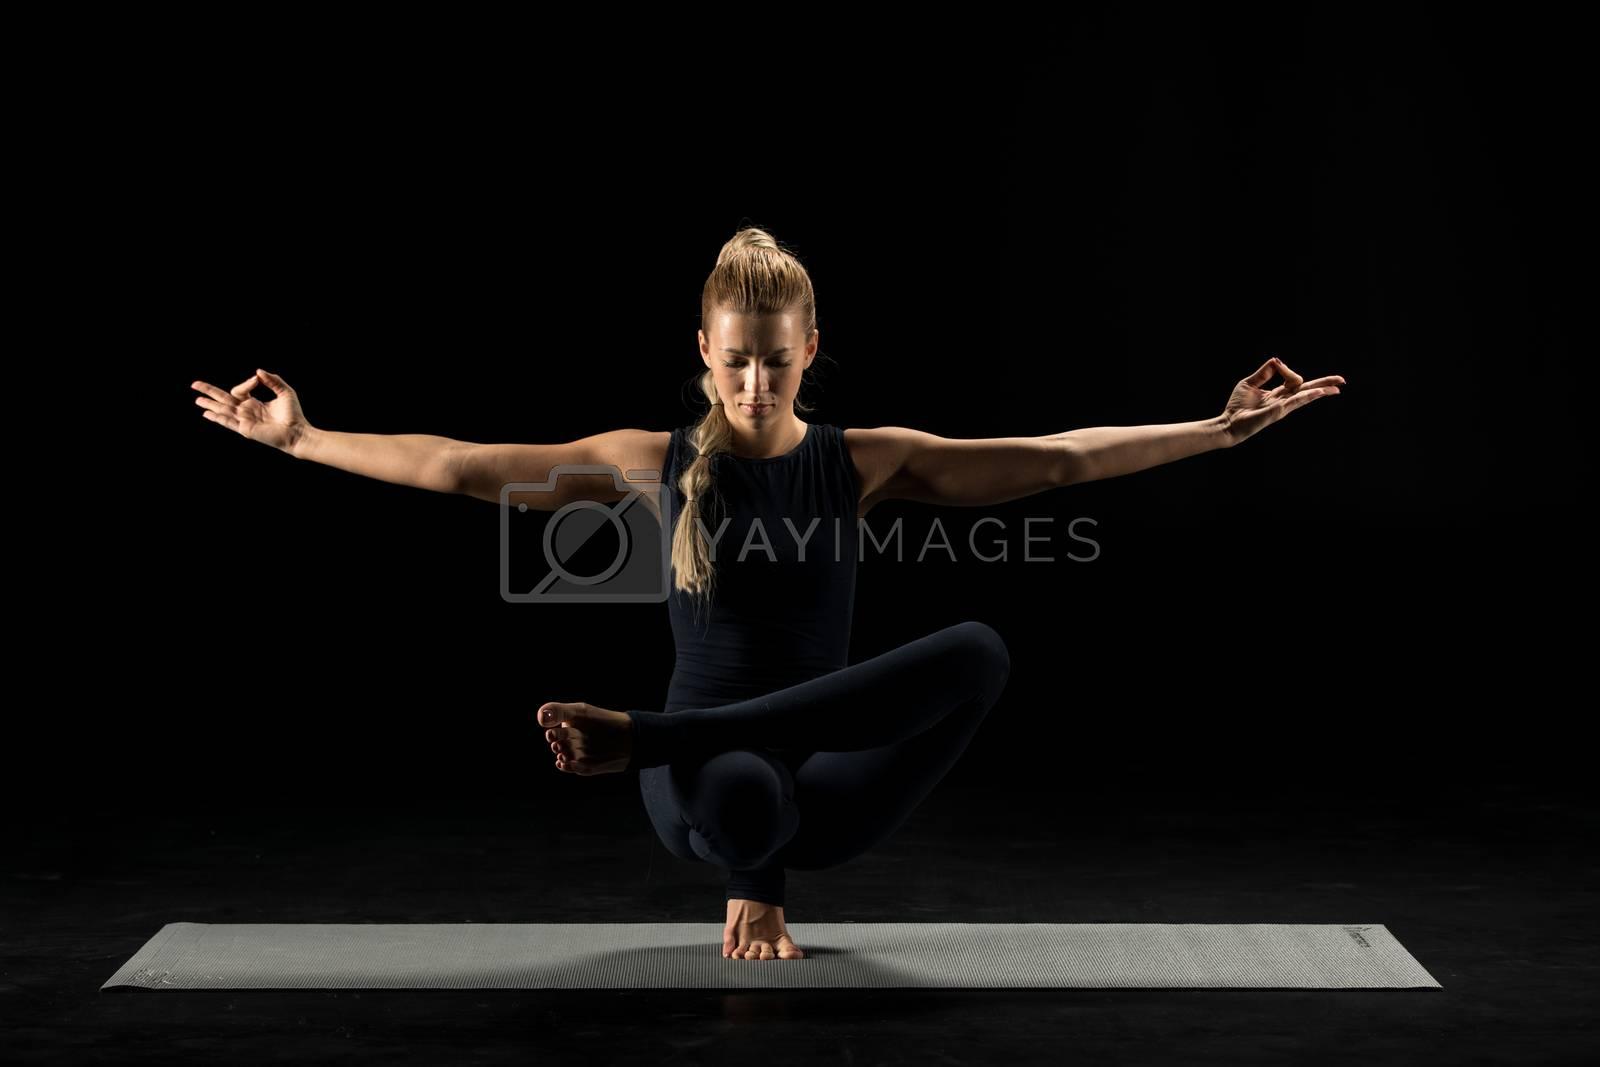 Woman practicing yoga performing squat pigeon pose on yoga mat